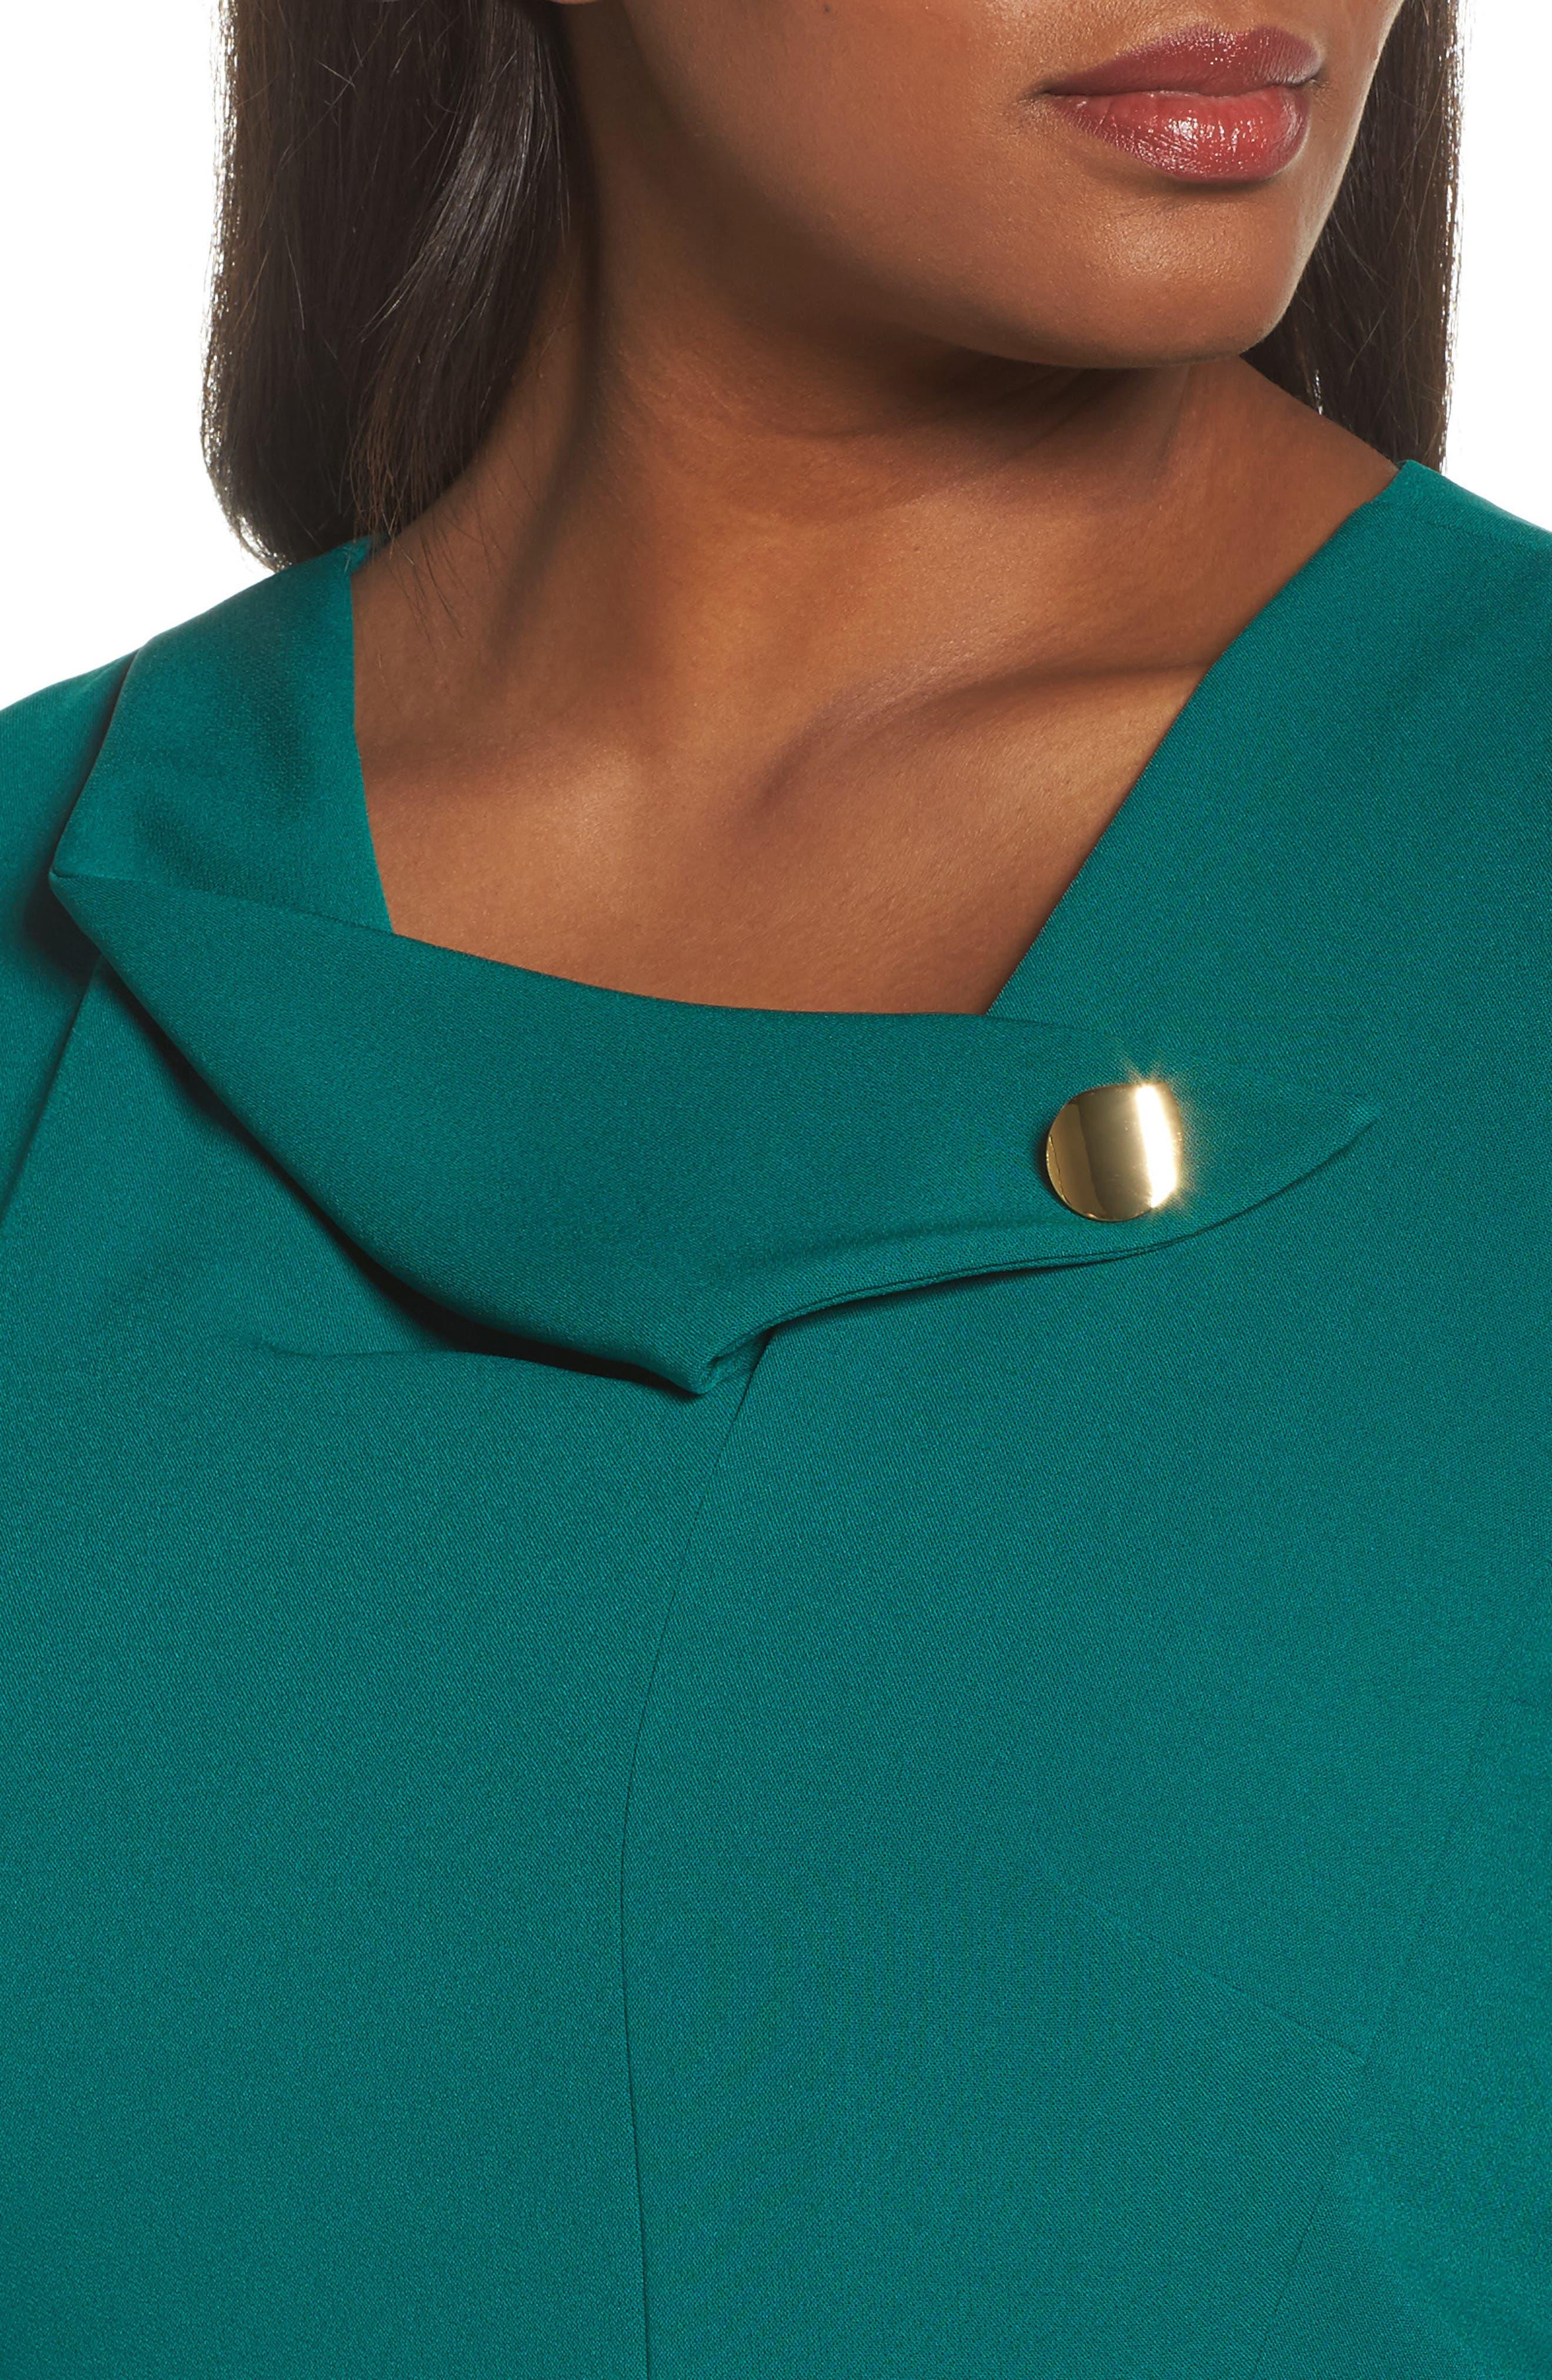 Envelope Neck with Button Sheath Dress,                             Alternate thumbnail 4, color,                             307